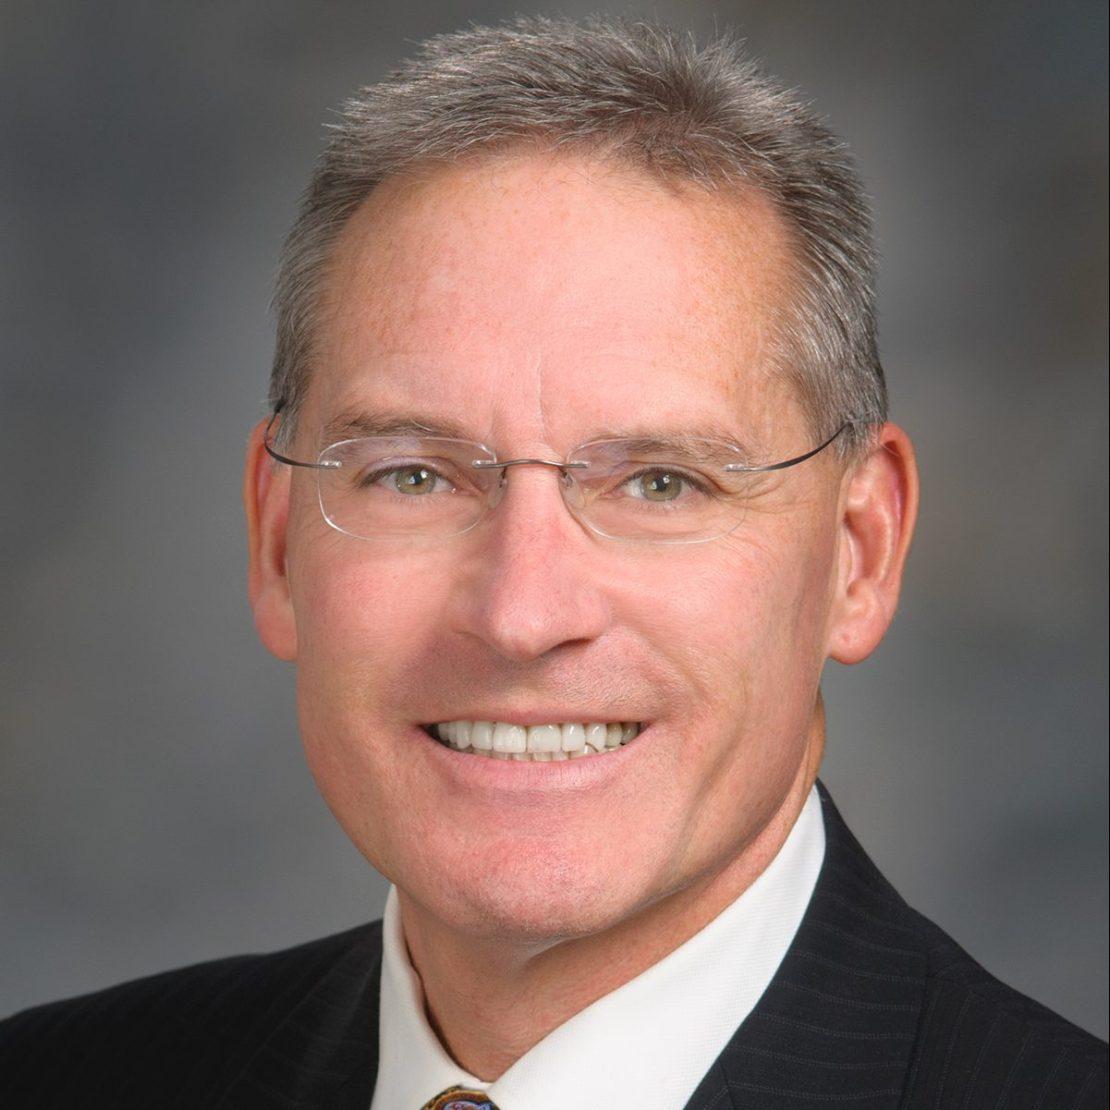 Charles E. Butler, MD, FACS